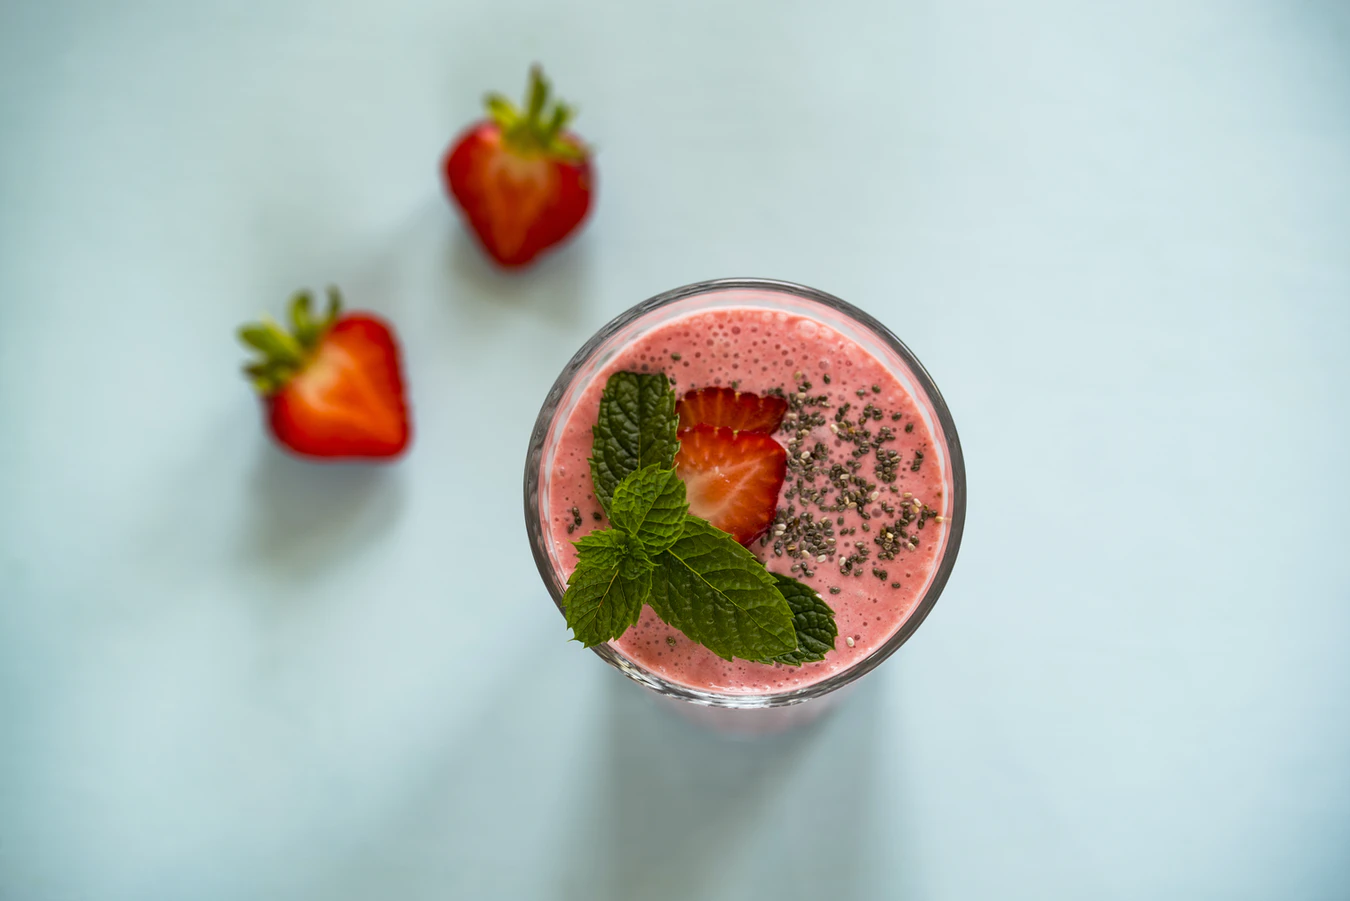 Milkshake with Strawberry